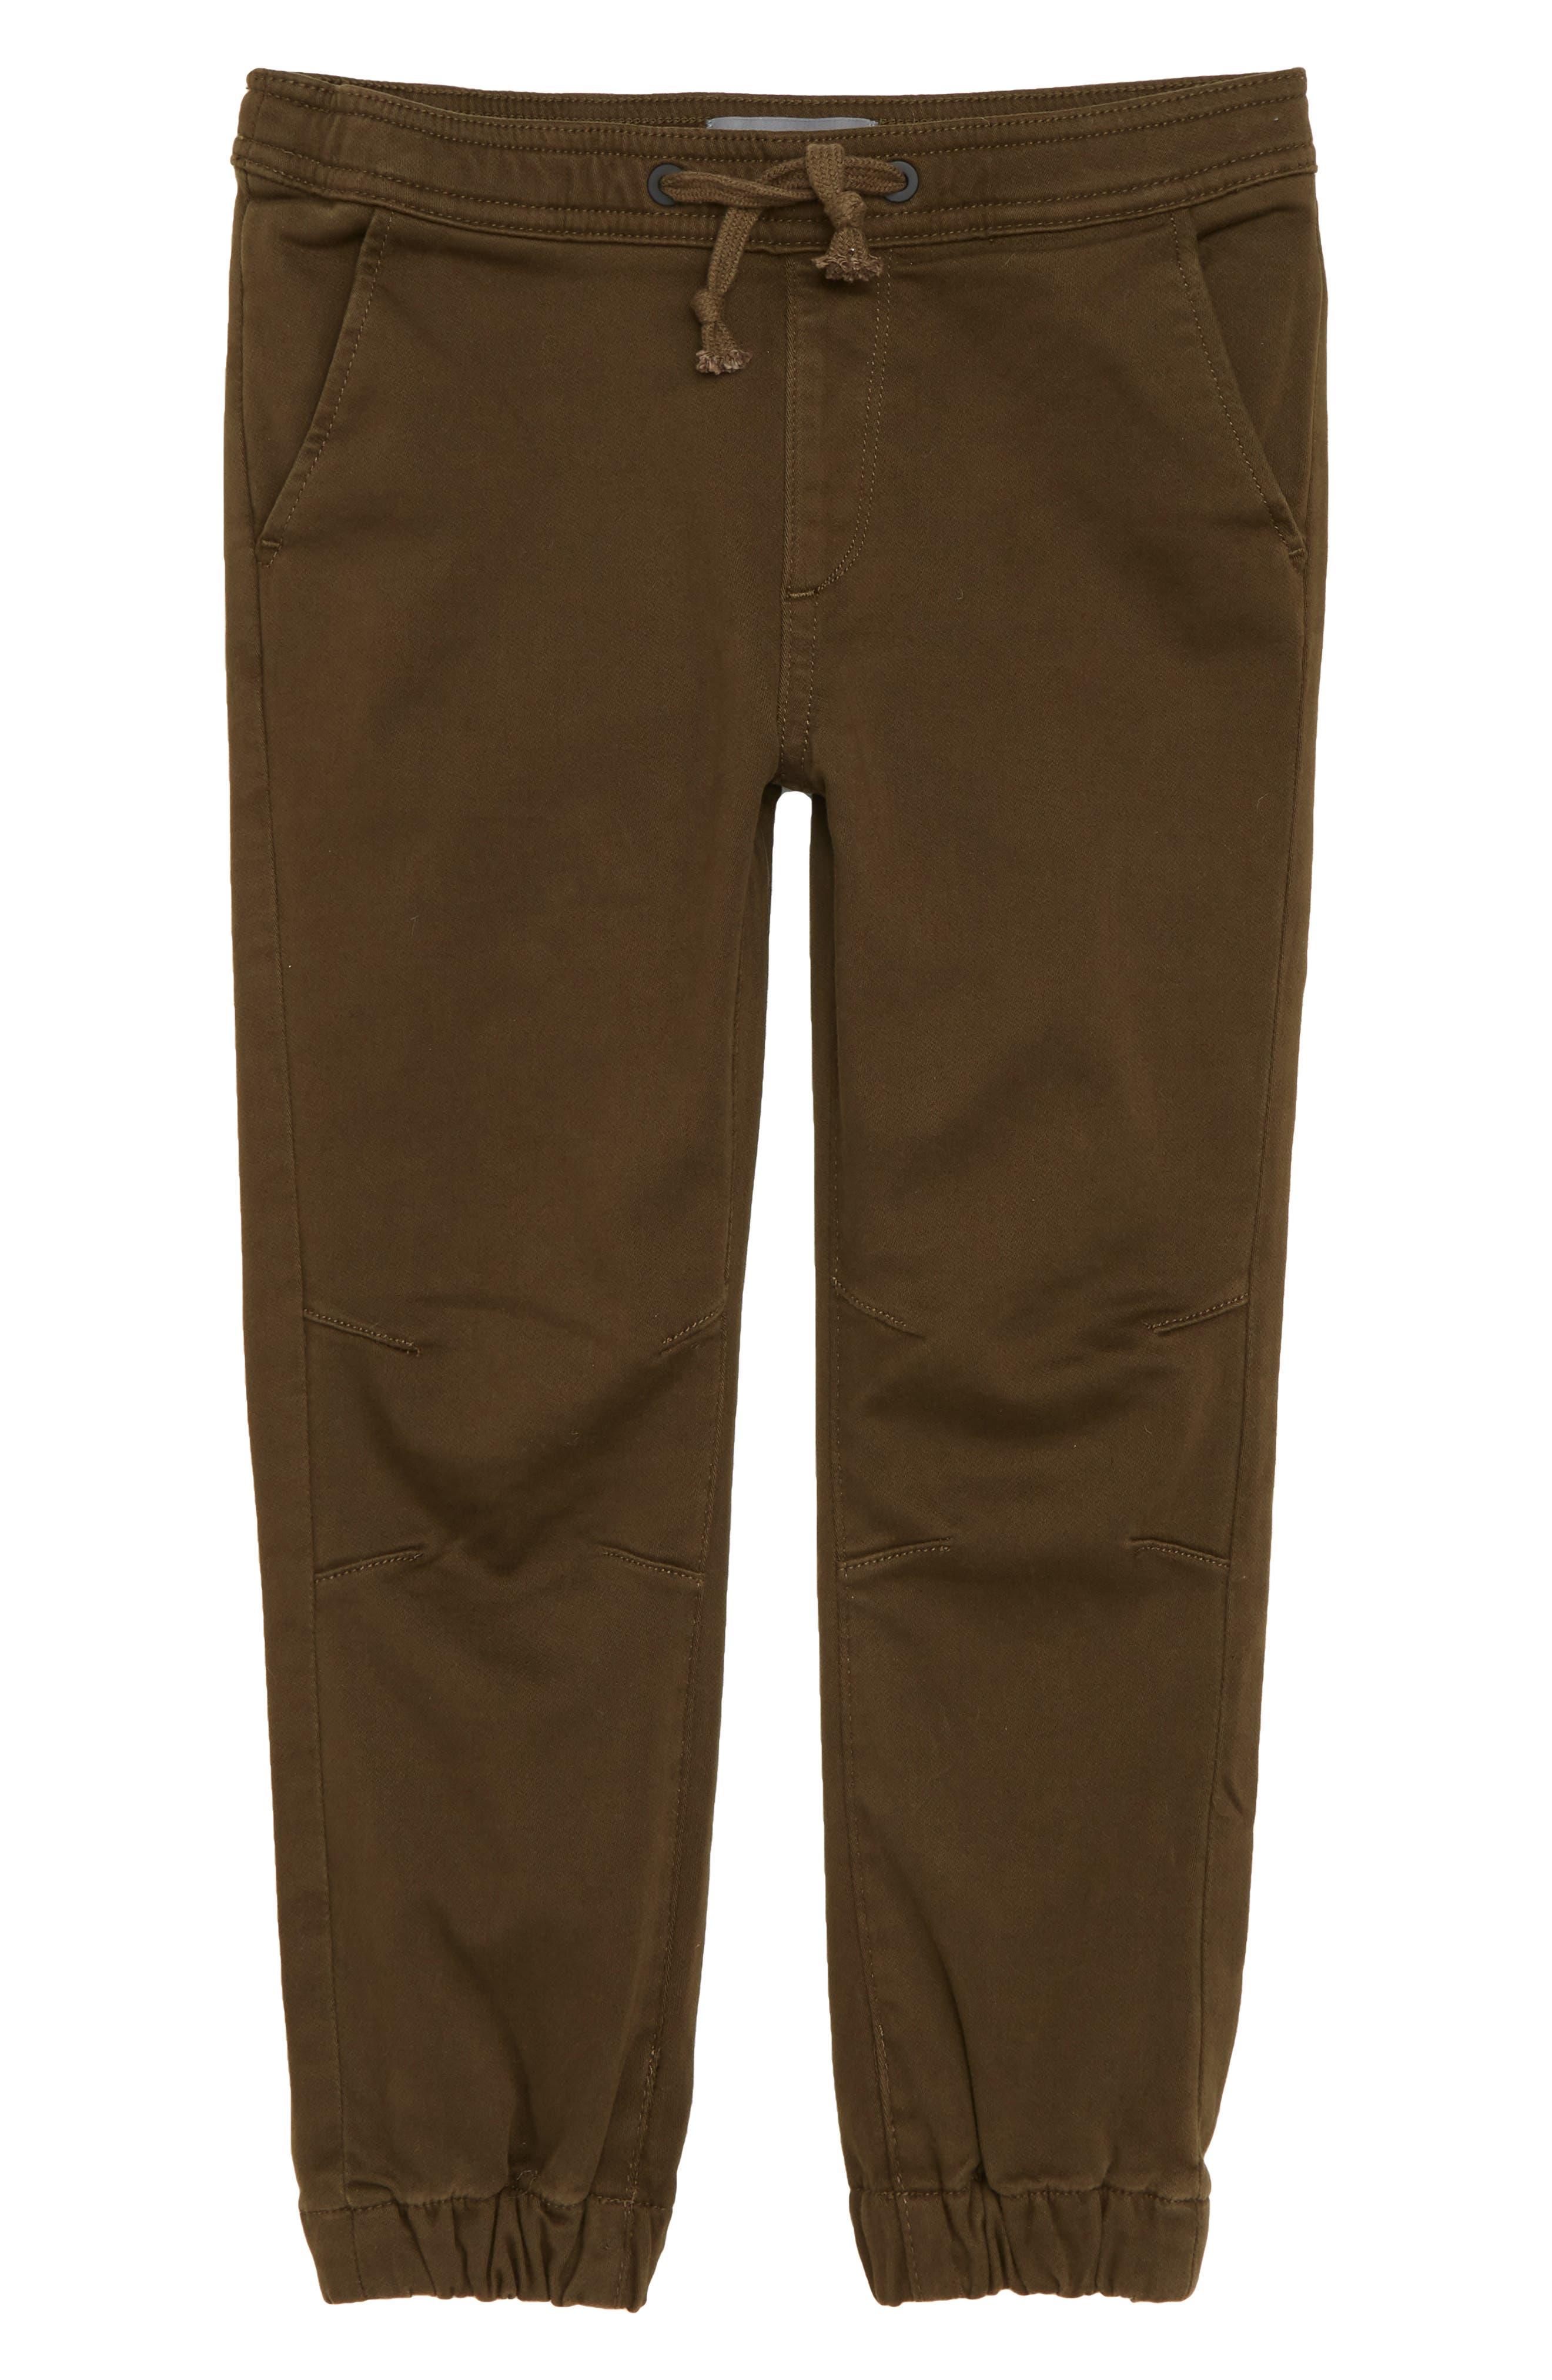 Jackson Knit Jogger Pants,                         Main,                         color, 300